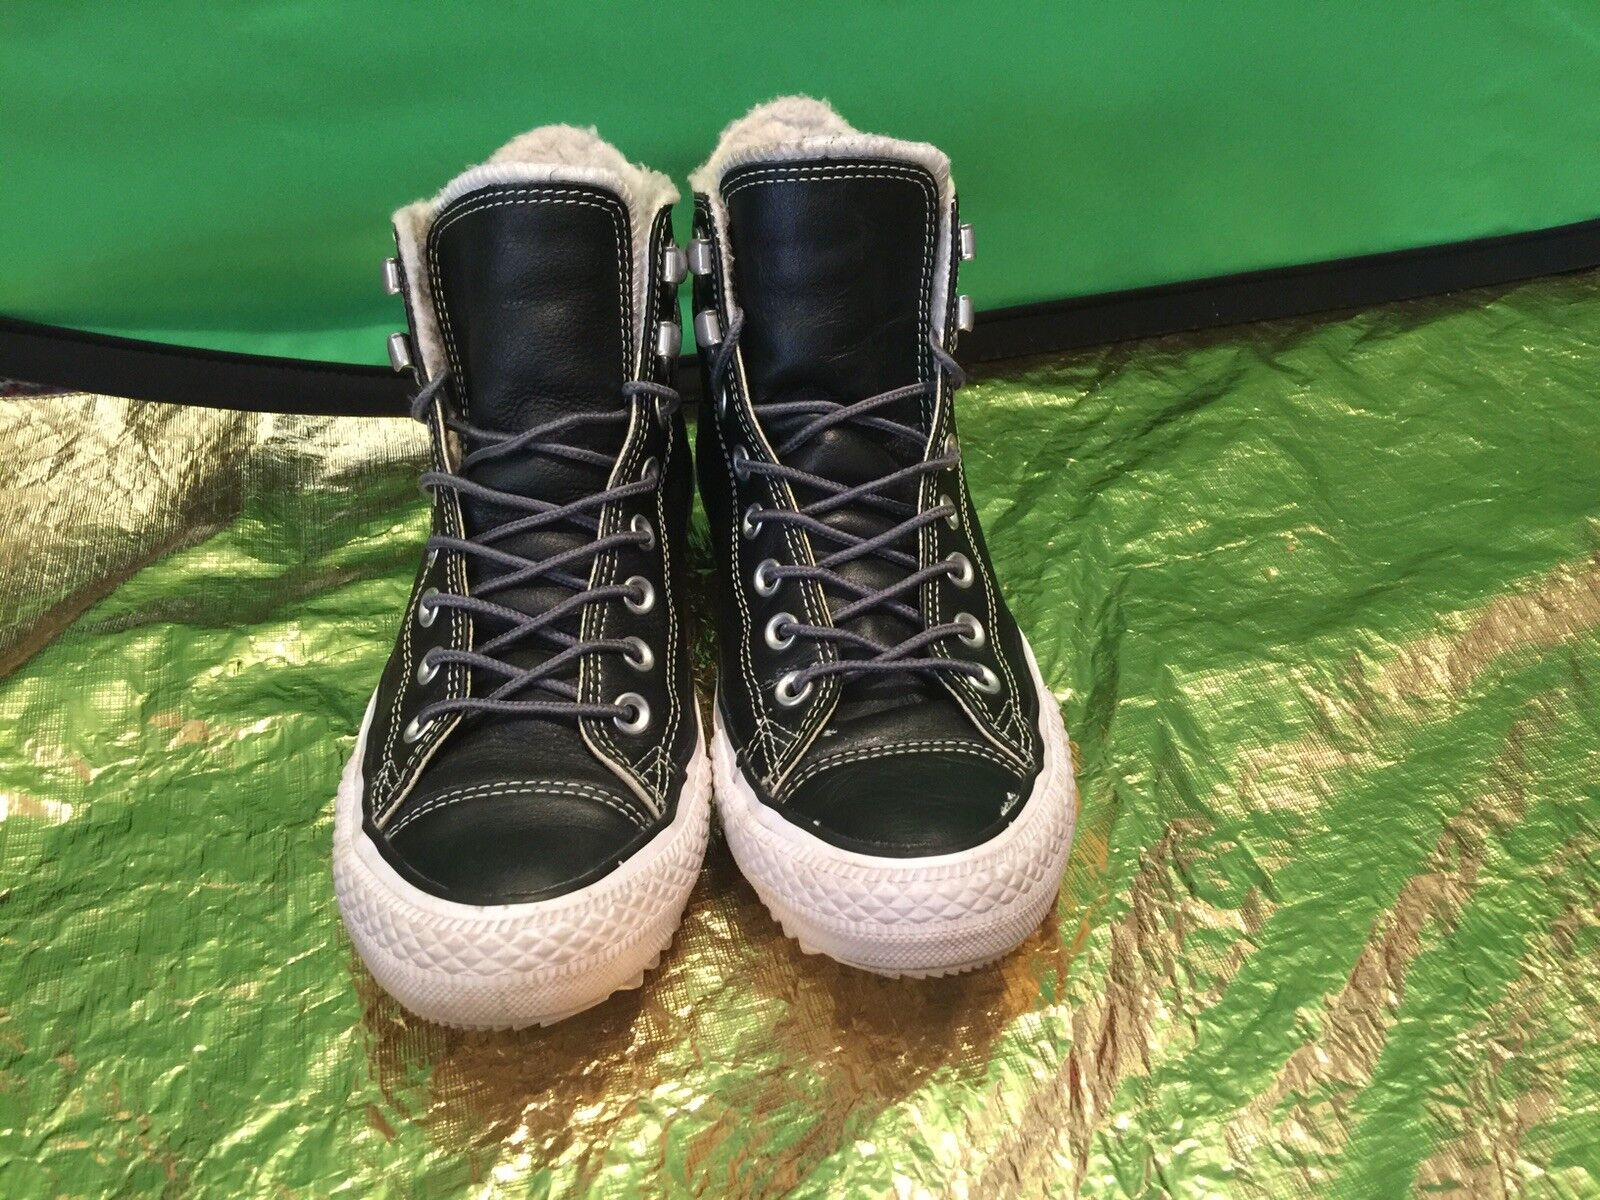 Converse All Star Cuero Negro Zapatillas Vulcanizadas para mujer mujer mujer Talla 9 Seminuevo eee1f7